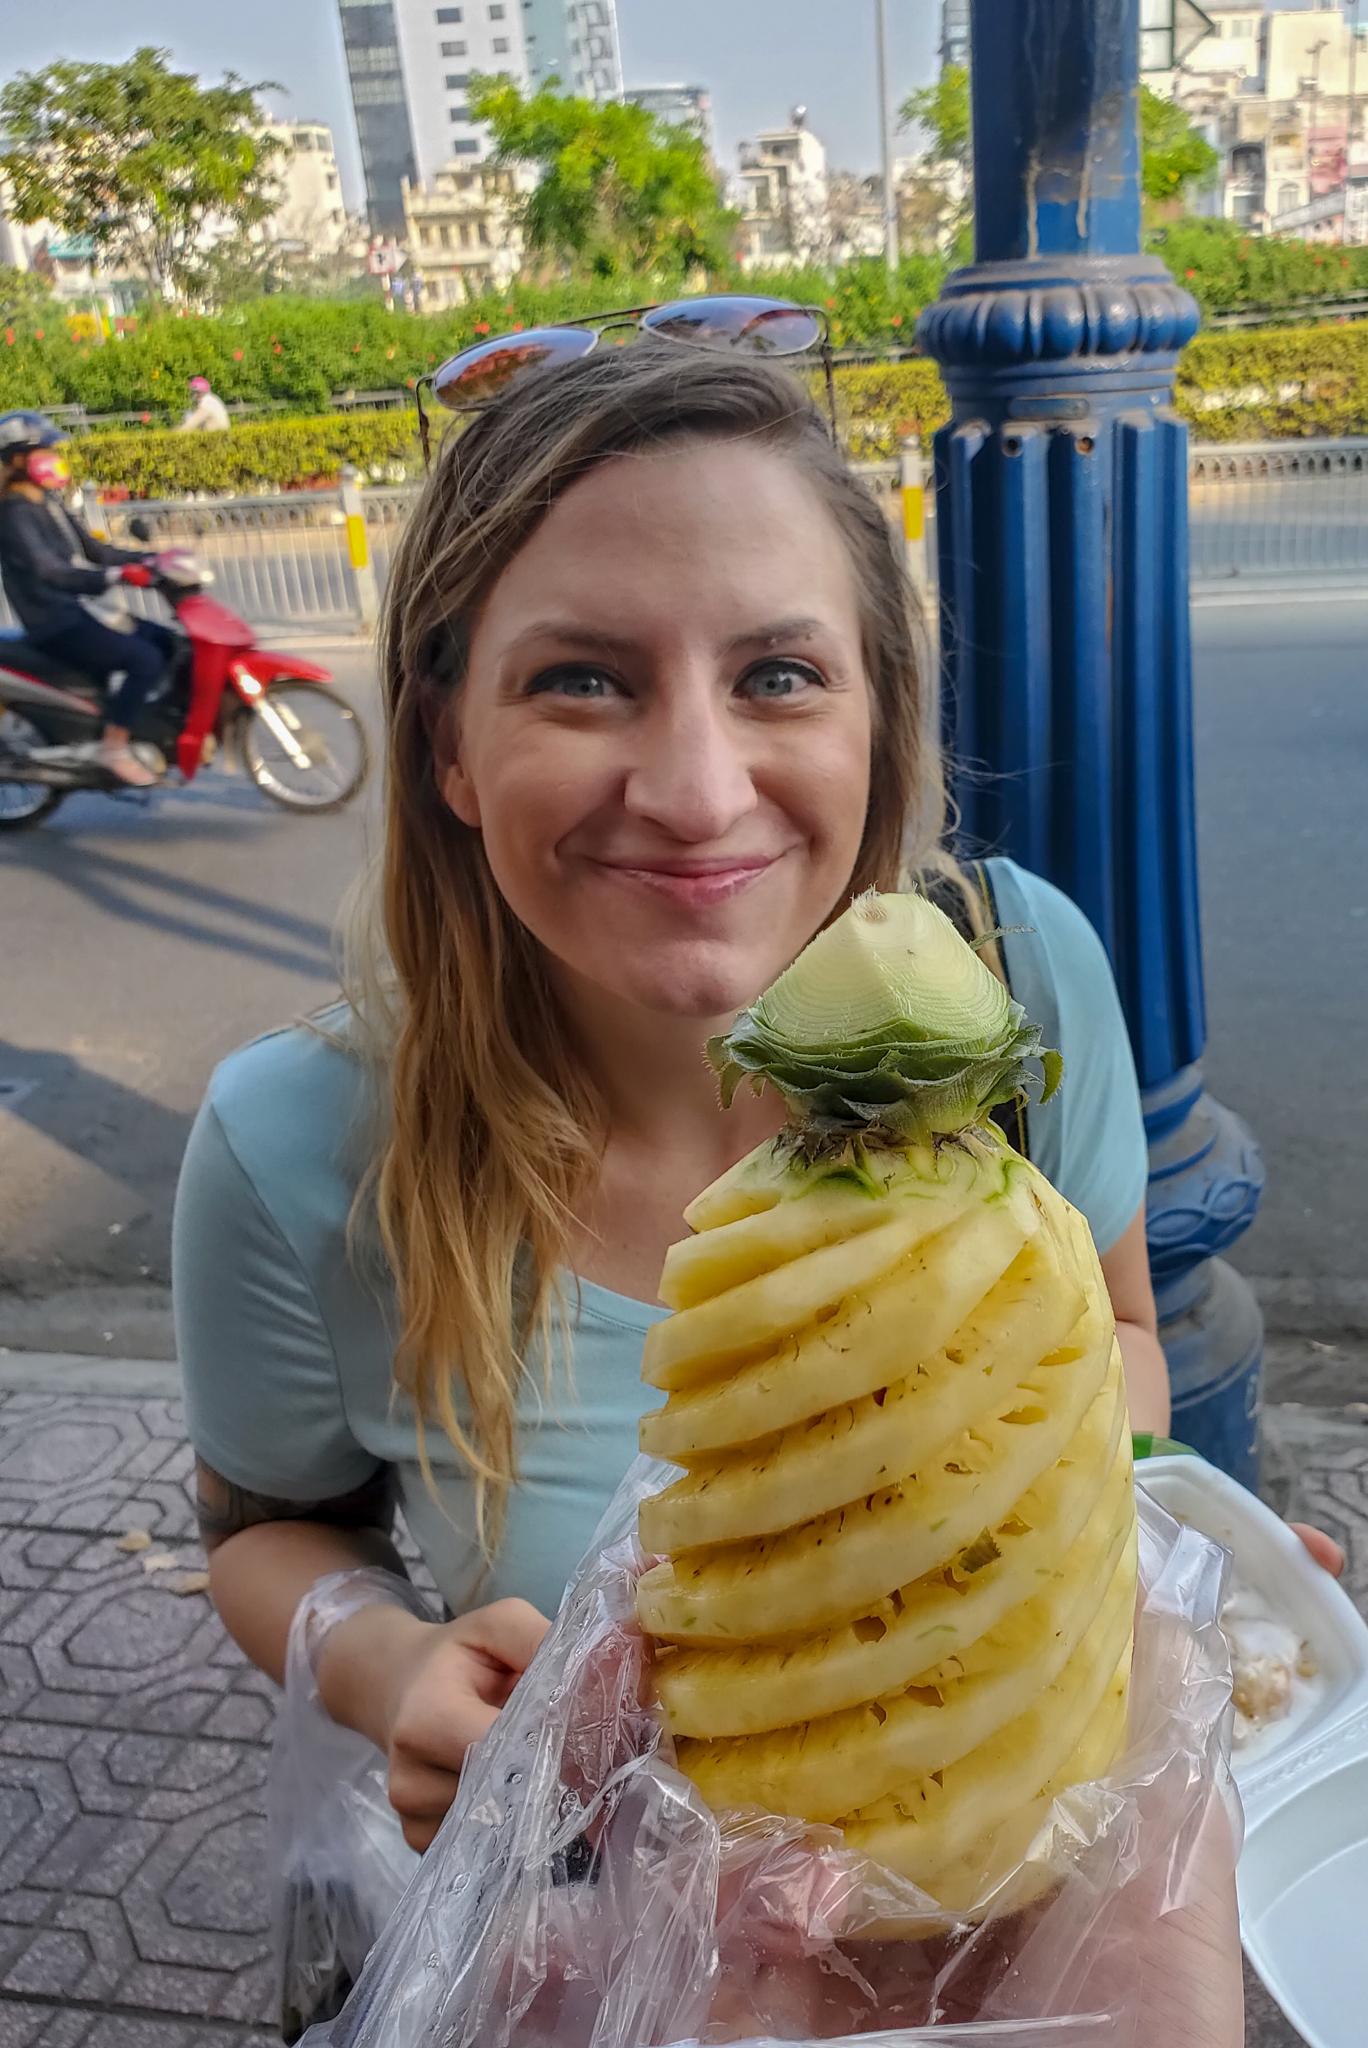 Uprooted-Traveler-48-hour-itinerary-Ho-Chi-Minh-market-breakfast.jpg